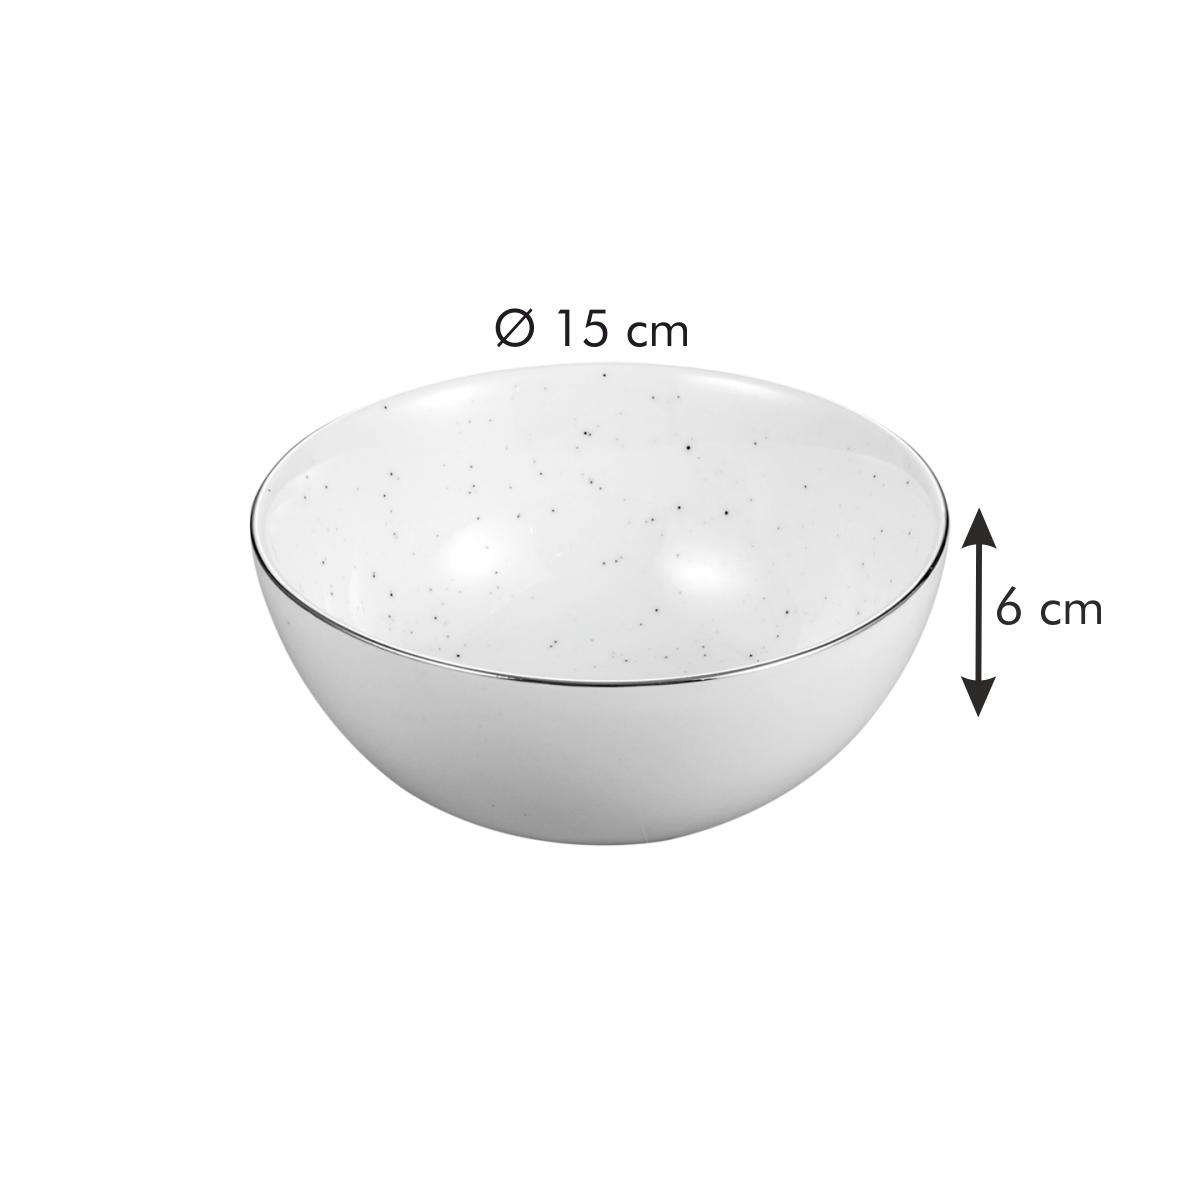 Miska CHARMANT ø 15 cm